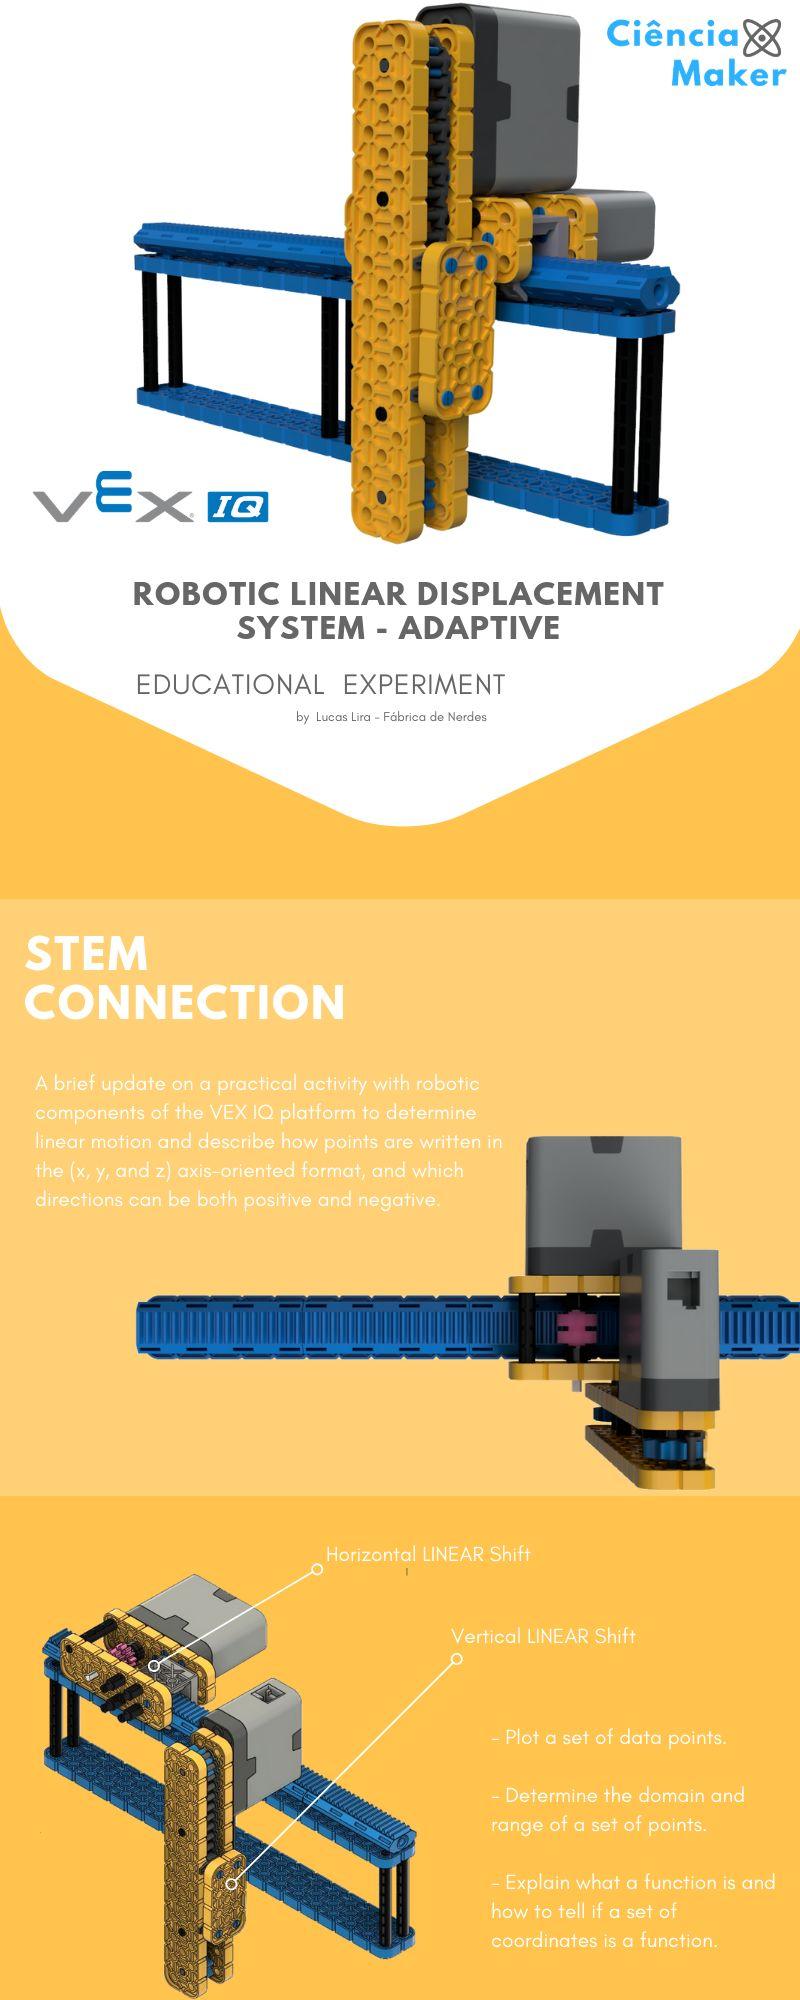 Vex-iq-robotics-stem---fabrica-de-nerdes-lcs2019-3500-3500